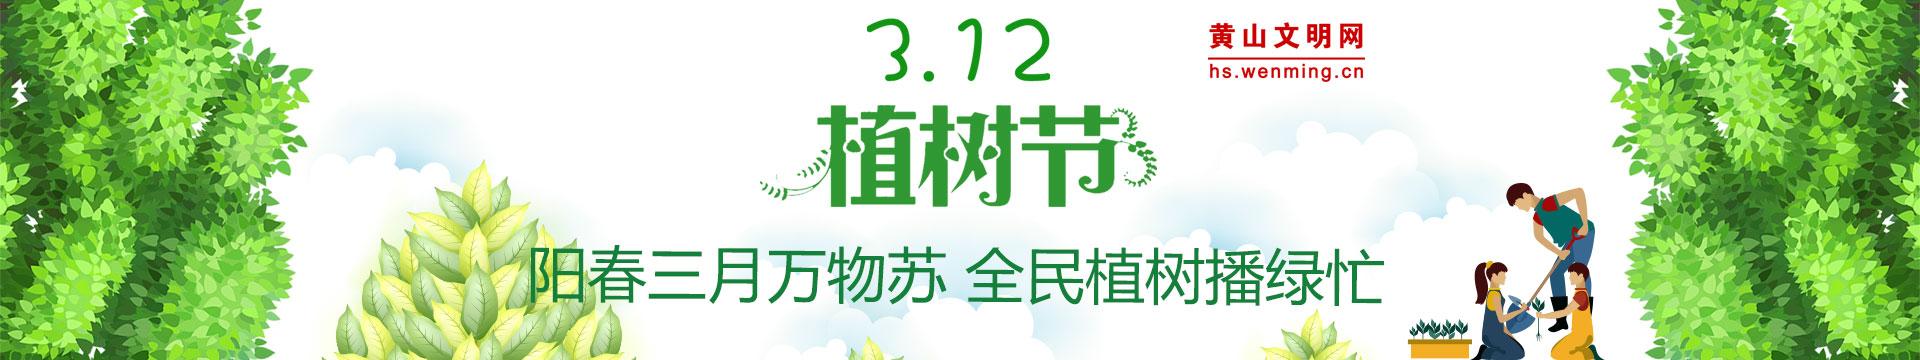 2018_zhishujie_banner.jpg